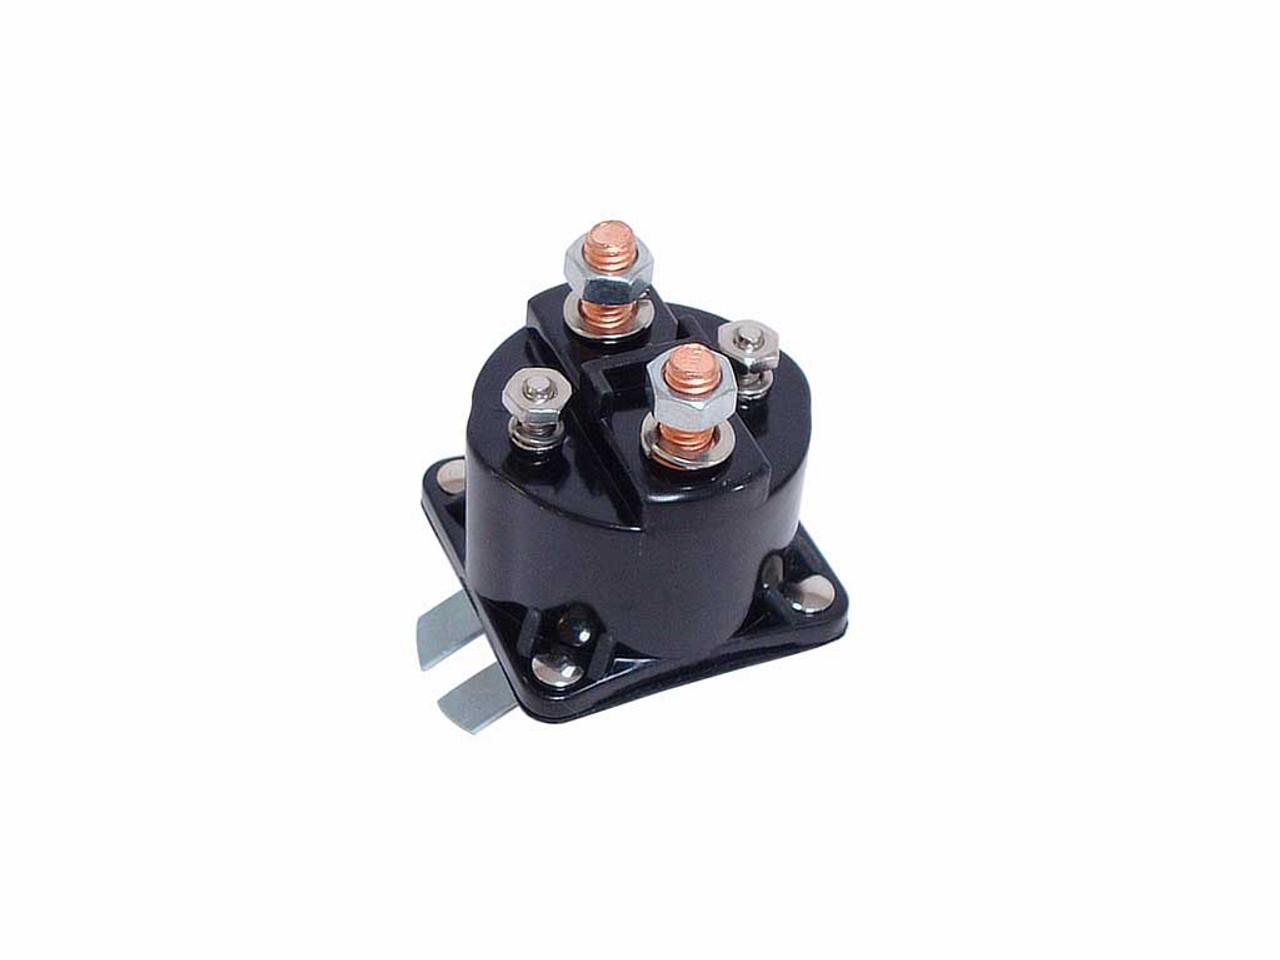 medium resolution of lift trailer solenoid wiring diagram